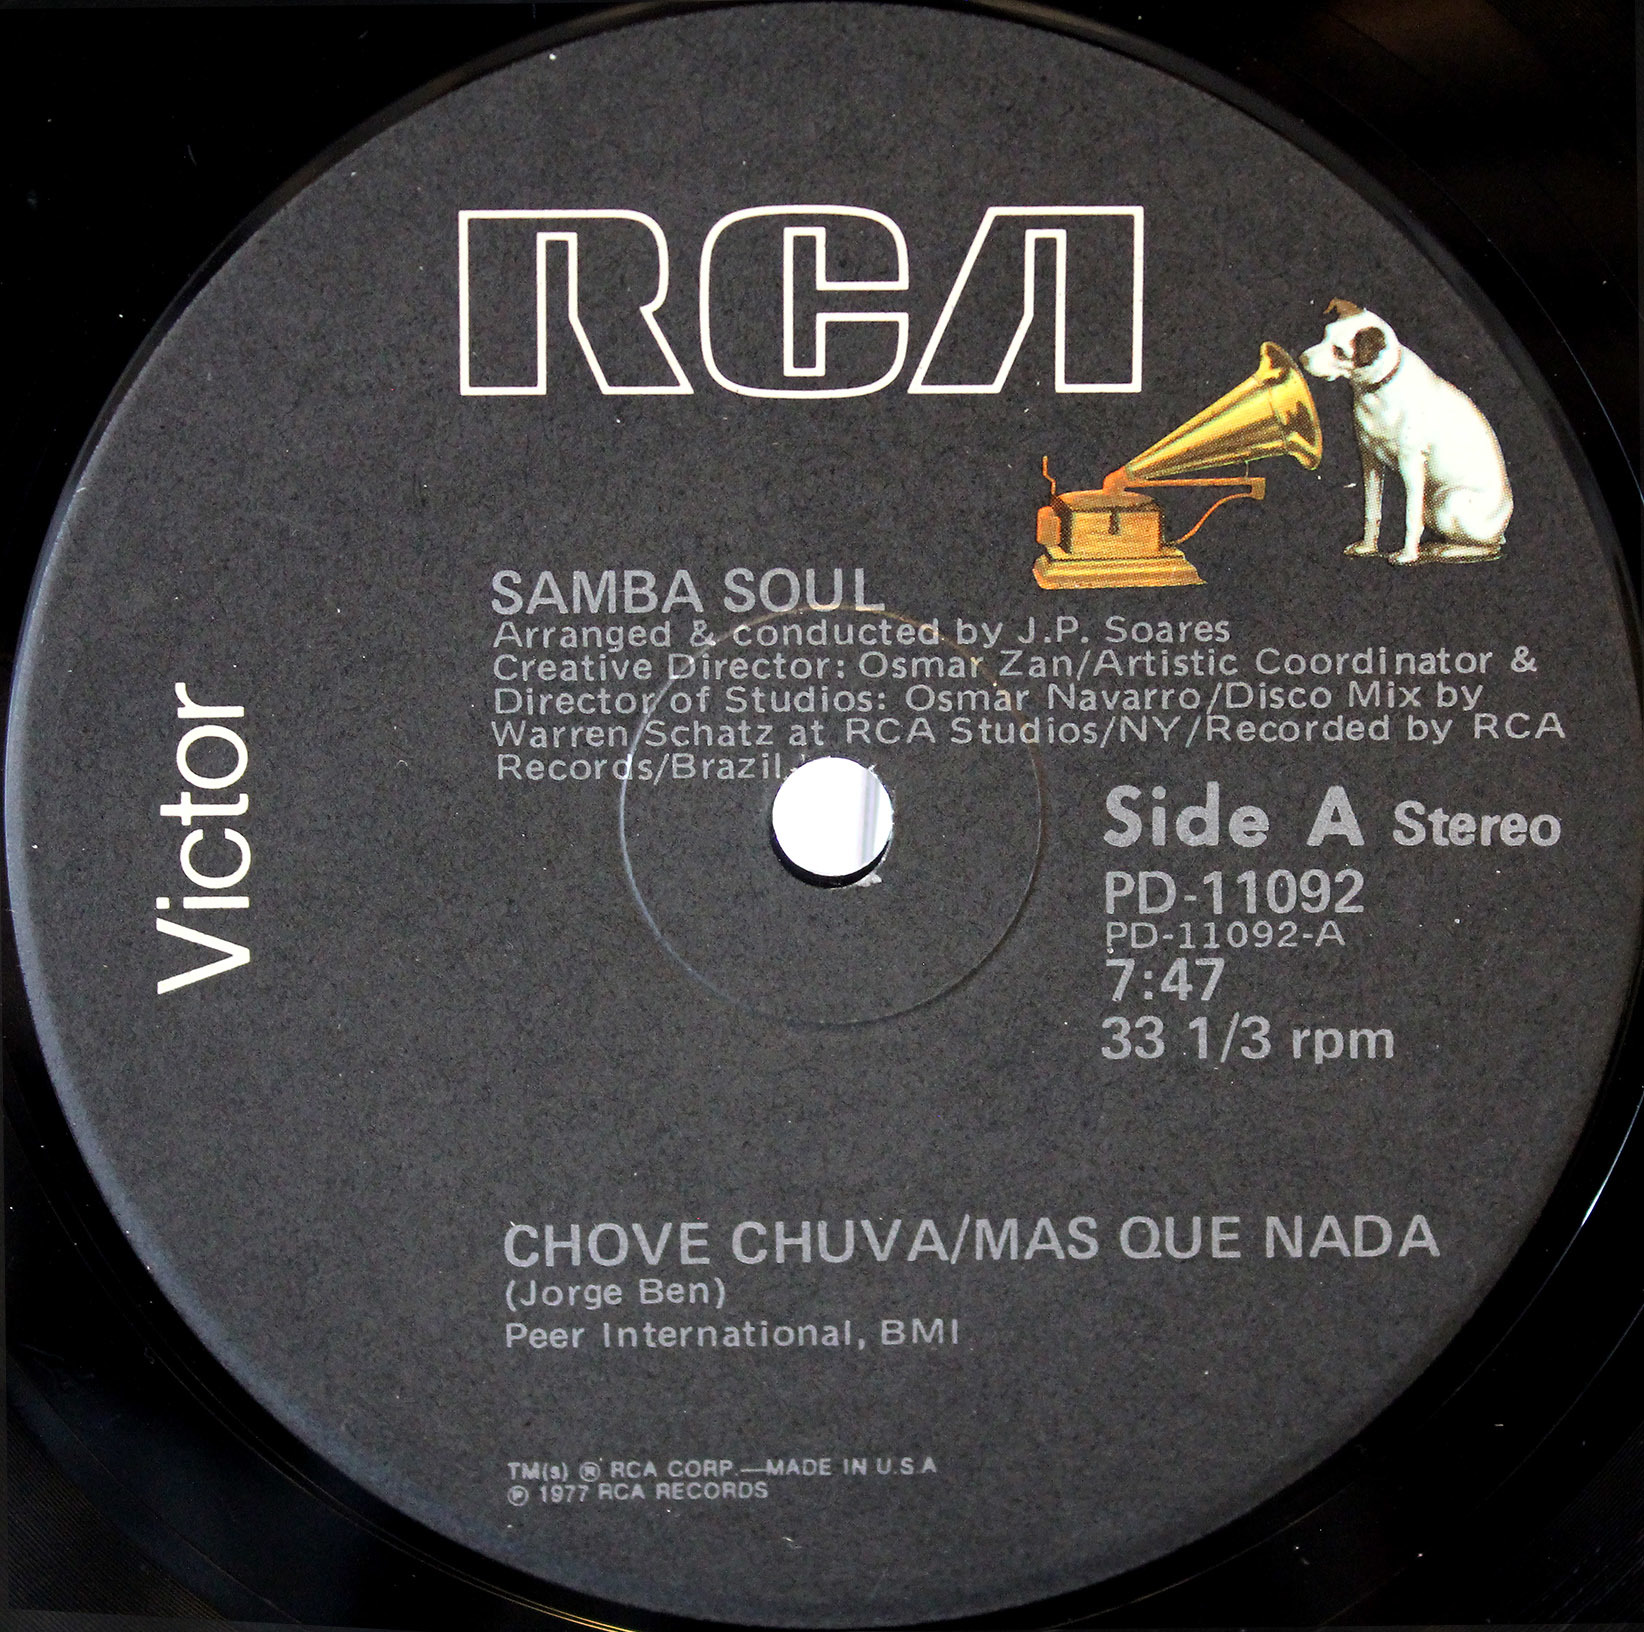 Samba Soul - Chove Chuva Mas Que Nada 03